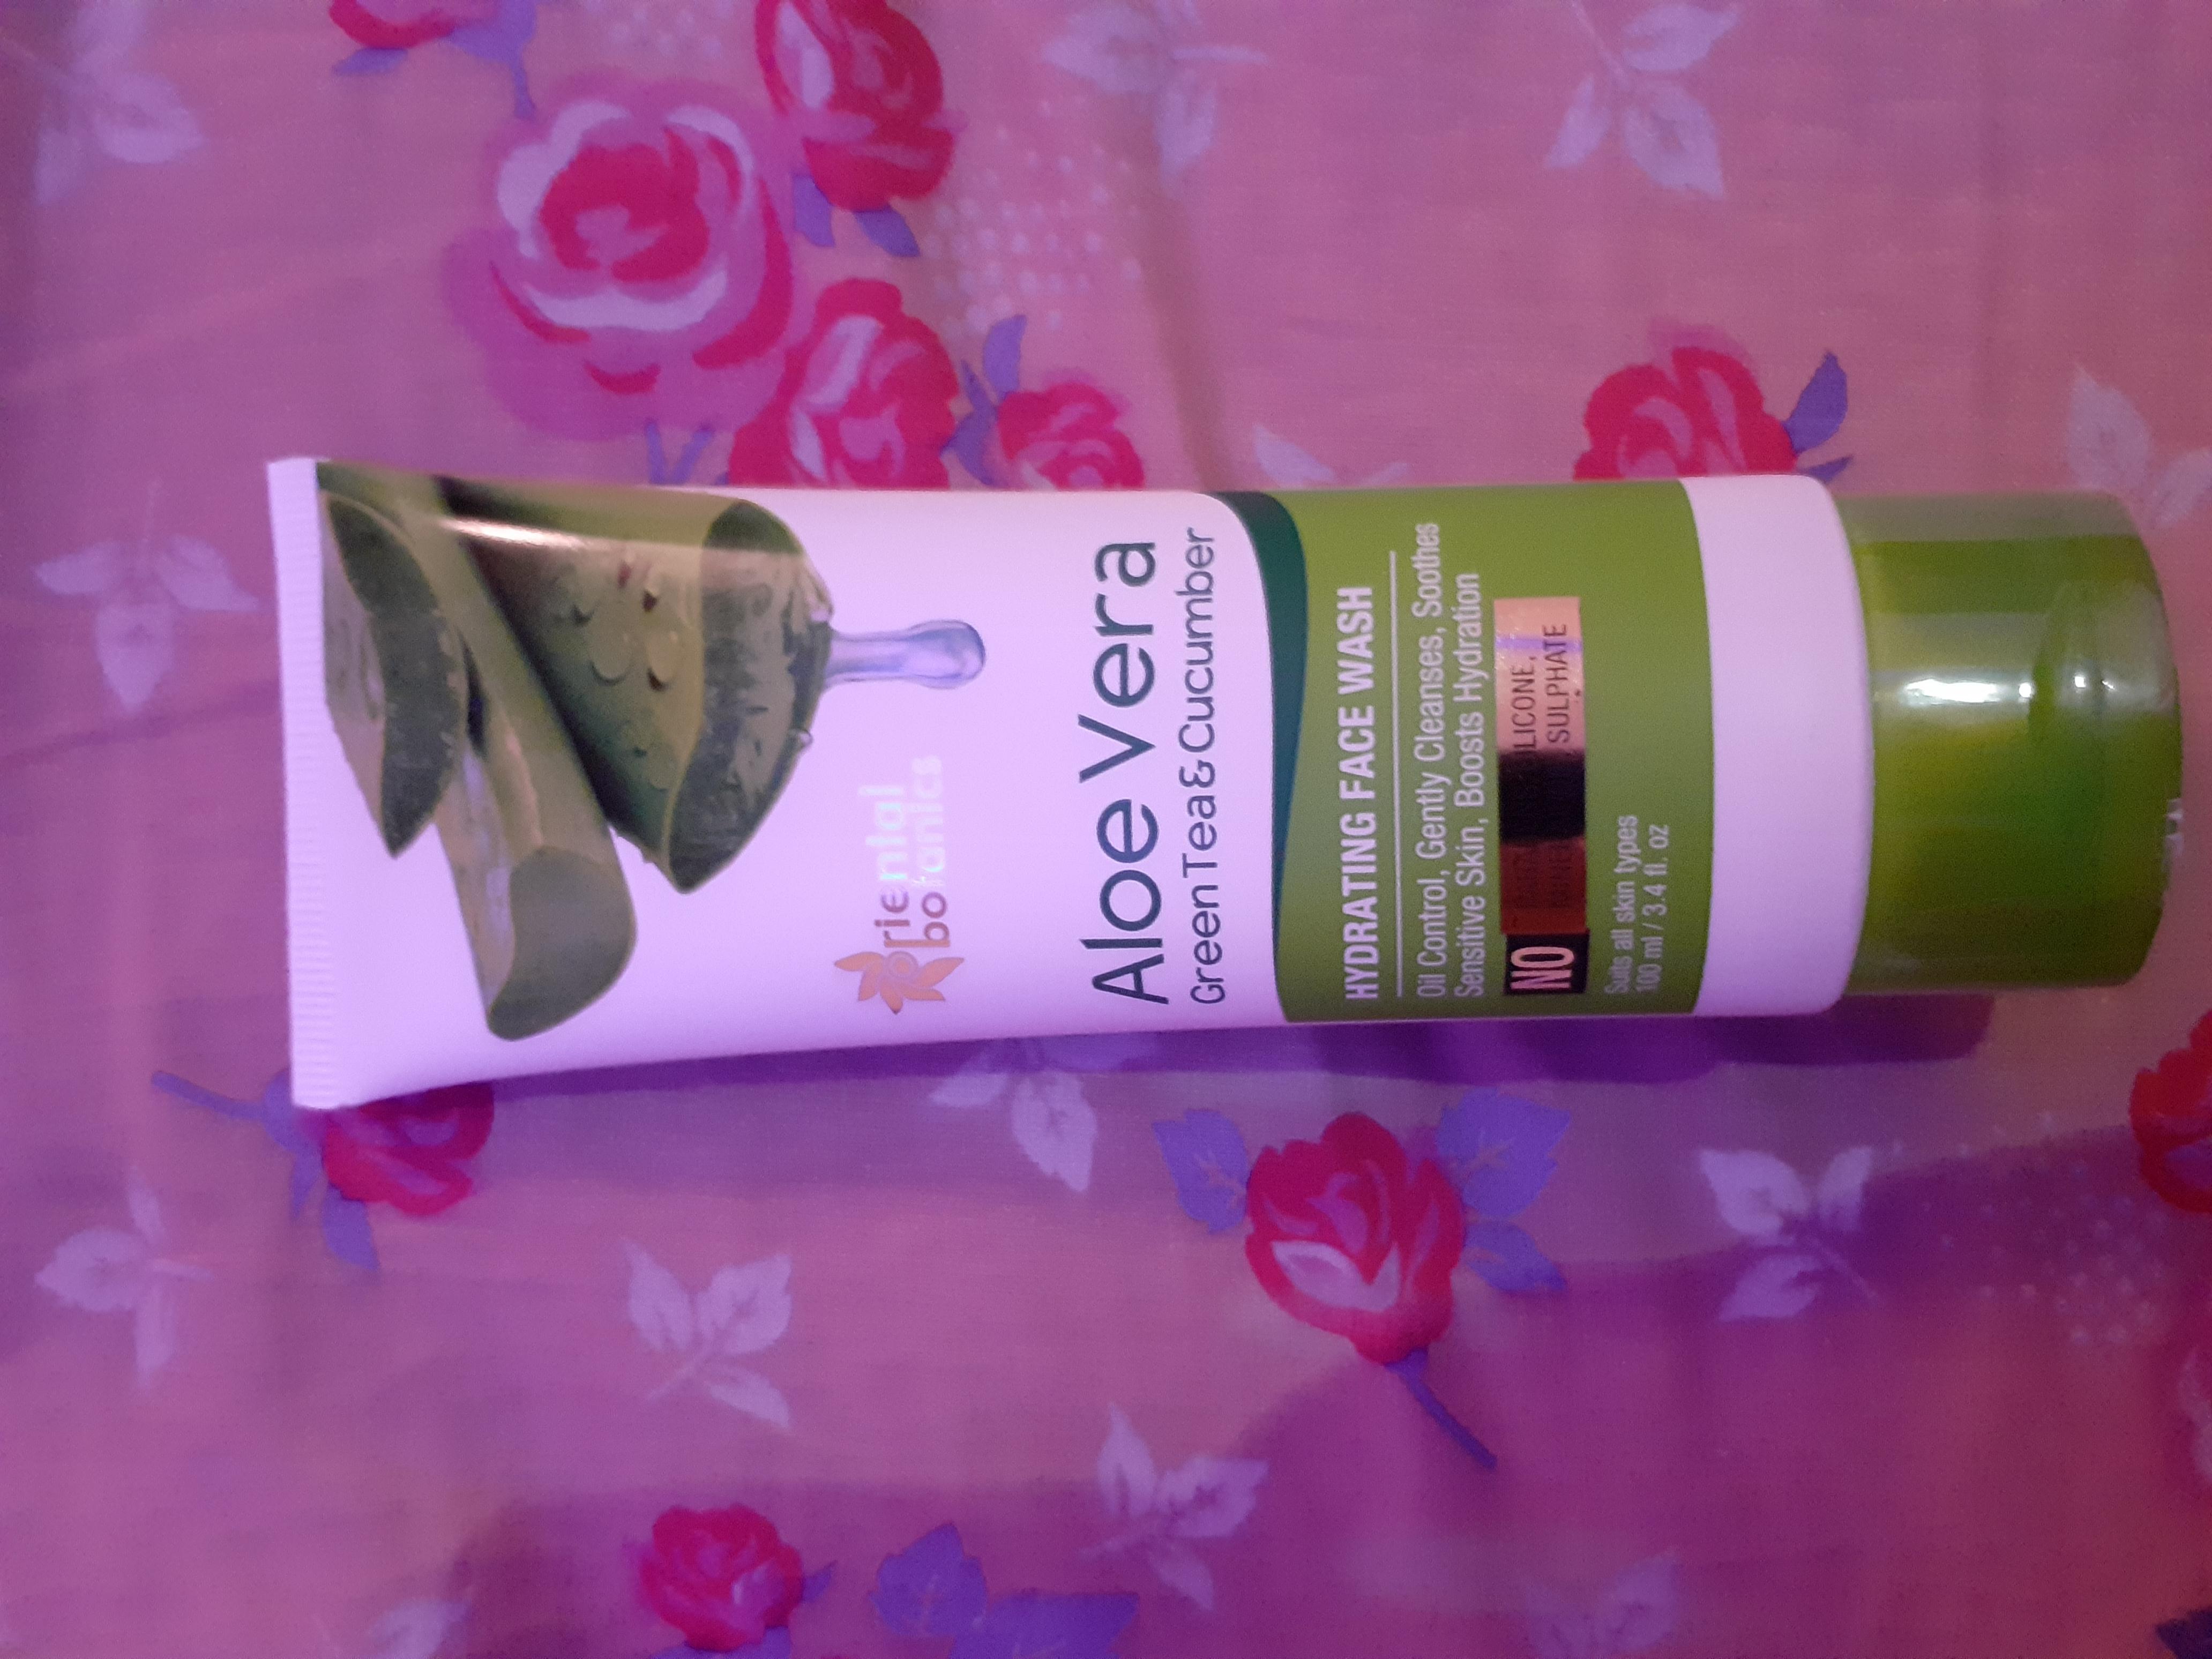 Oriental Botanics Aloe Vera, Green Tea & Cucumber Hydrating Face Wash -Aloevera face wash-By swati_shah_